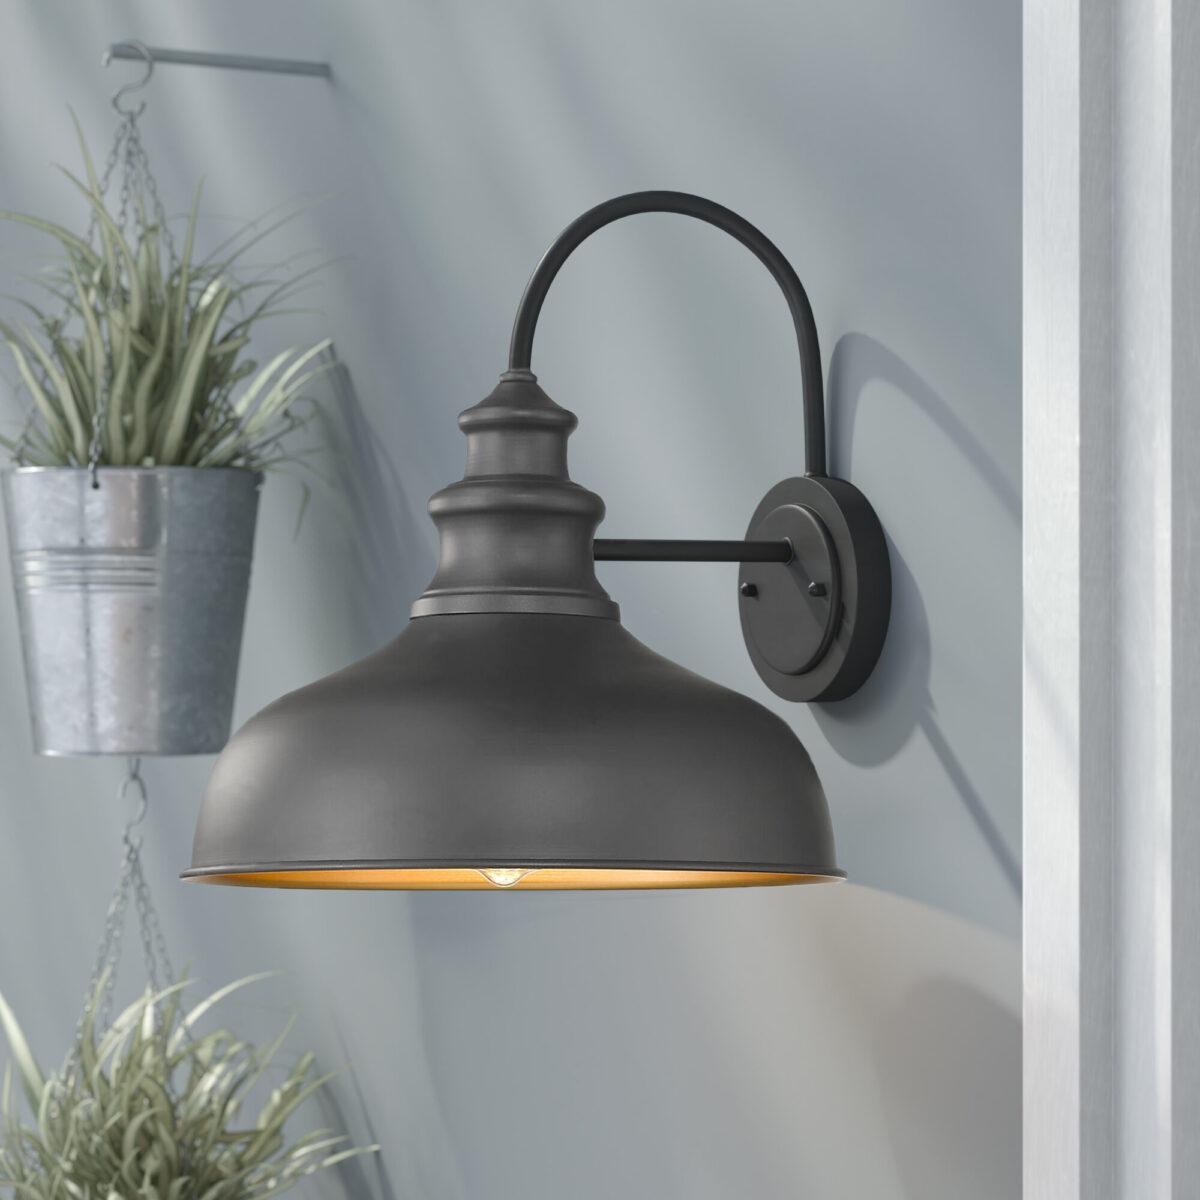 lighting-the-veranda-project-and-ideas-21